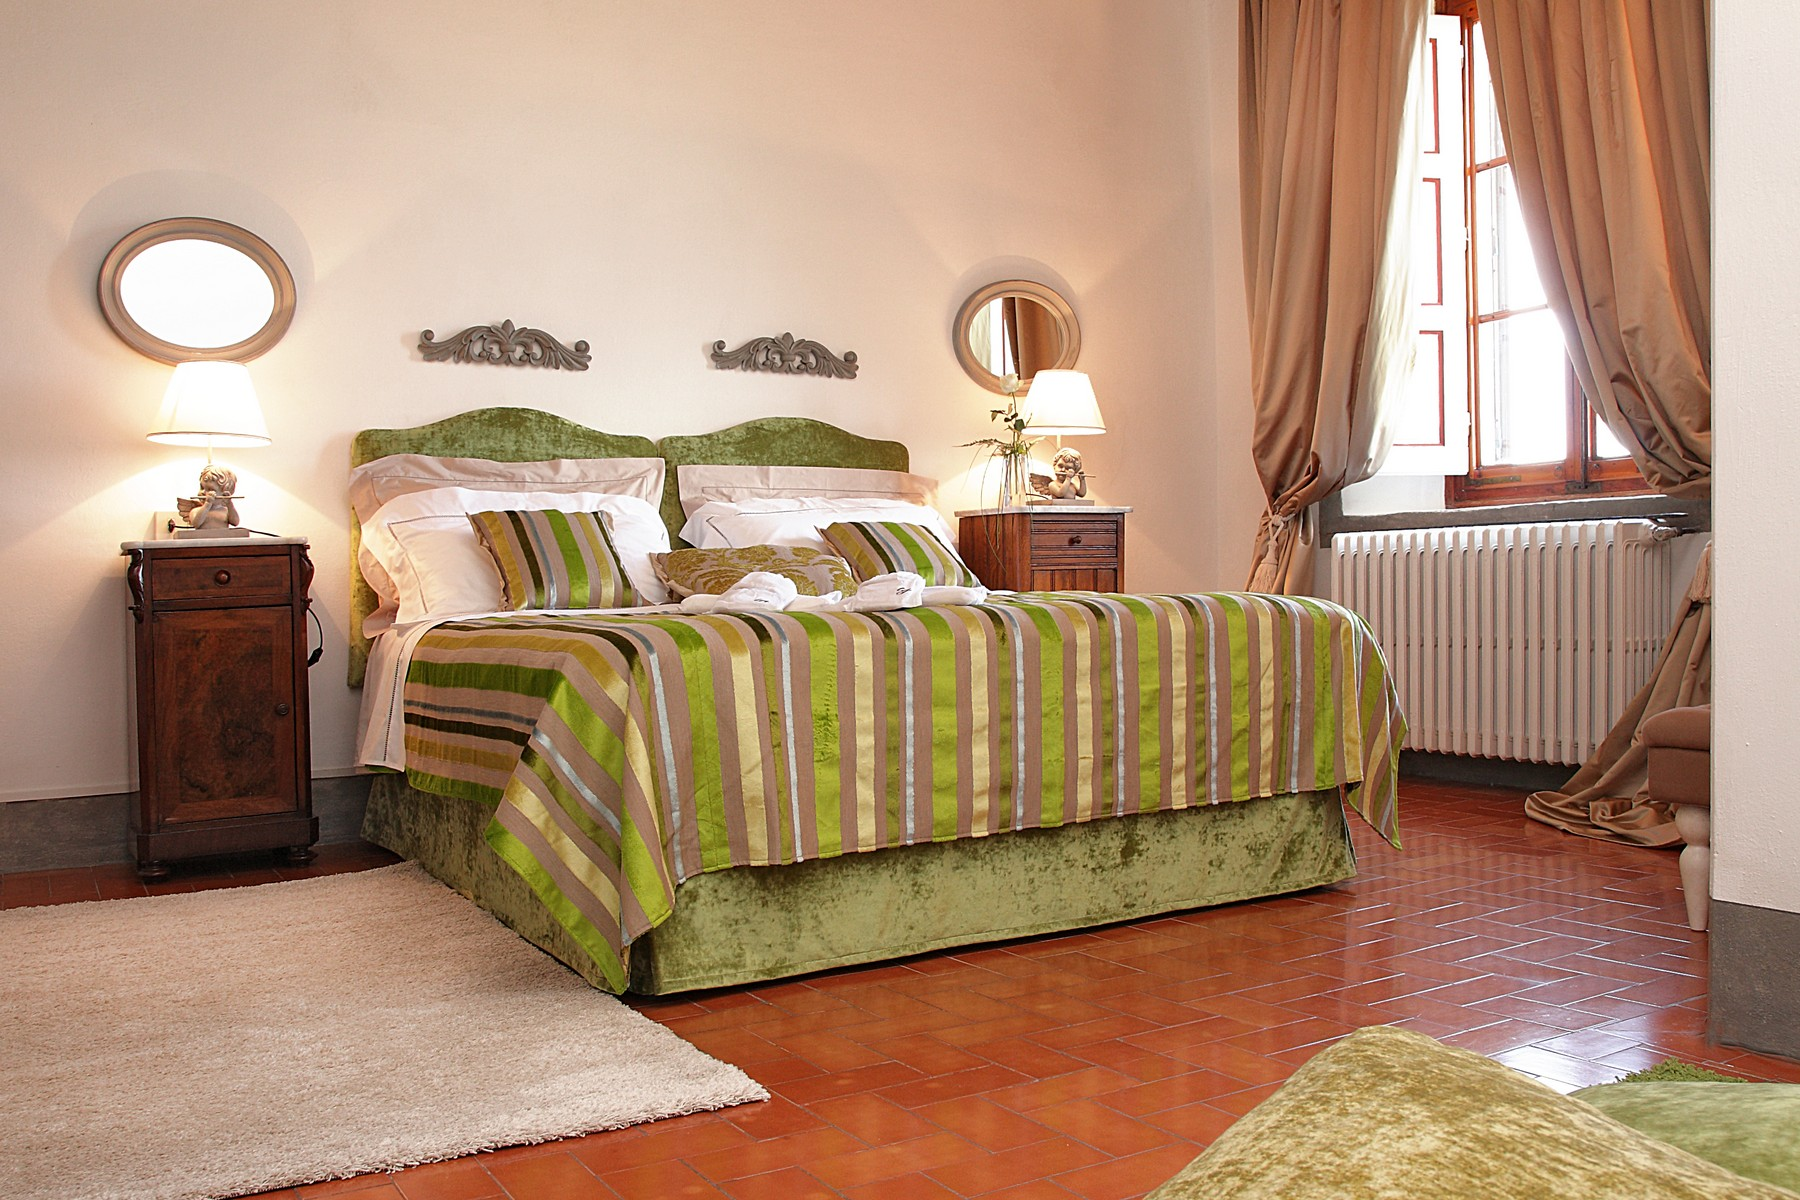 Villa in Vendita a Gaiole In Chianti: 5 locali, 4285 mq - Foto 10